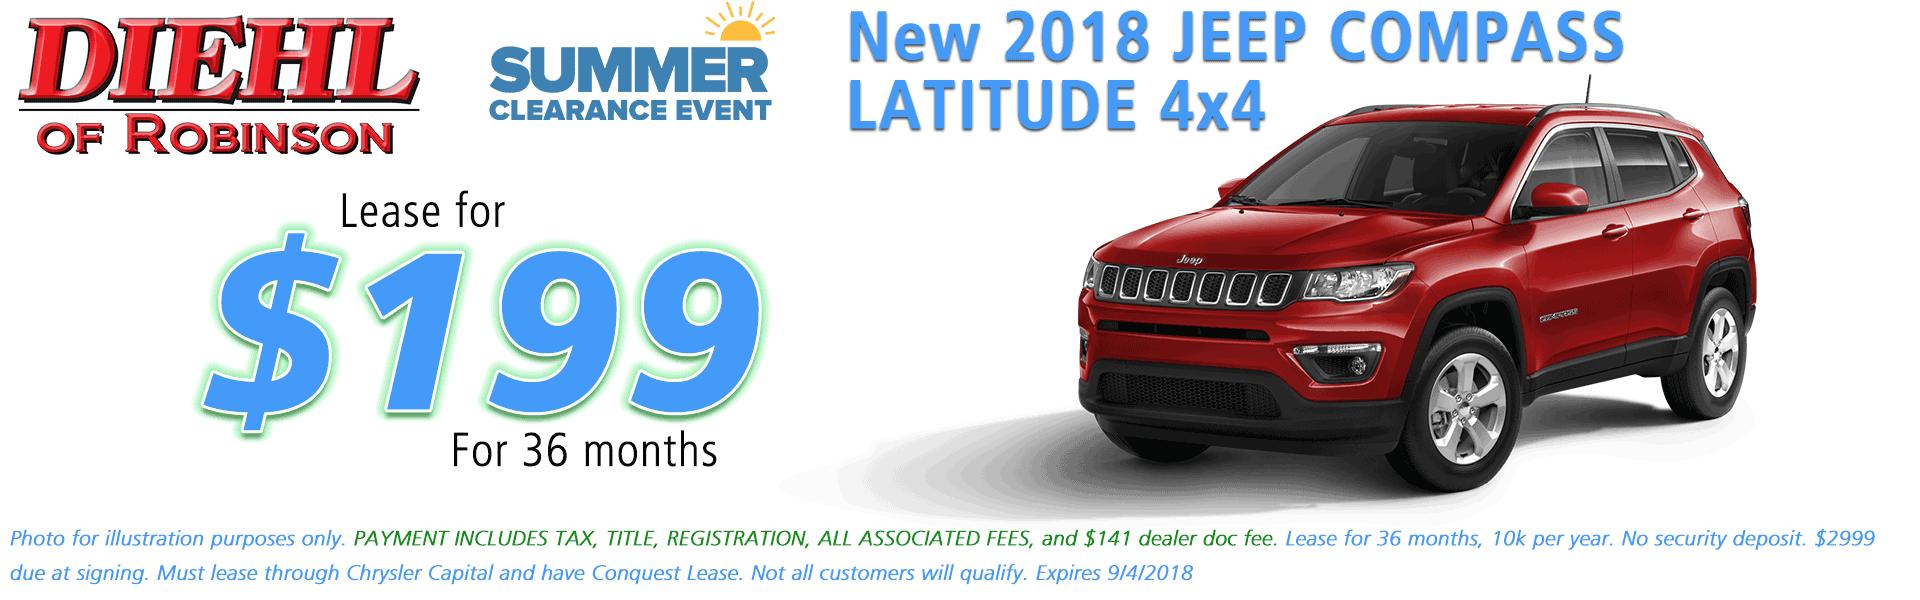 Diehl of Robinson Chrysler Dodge Jeep Ram Robinson Township PA 15136 NEW 2018 JEEP COMPASS LATITUDE 4X4